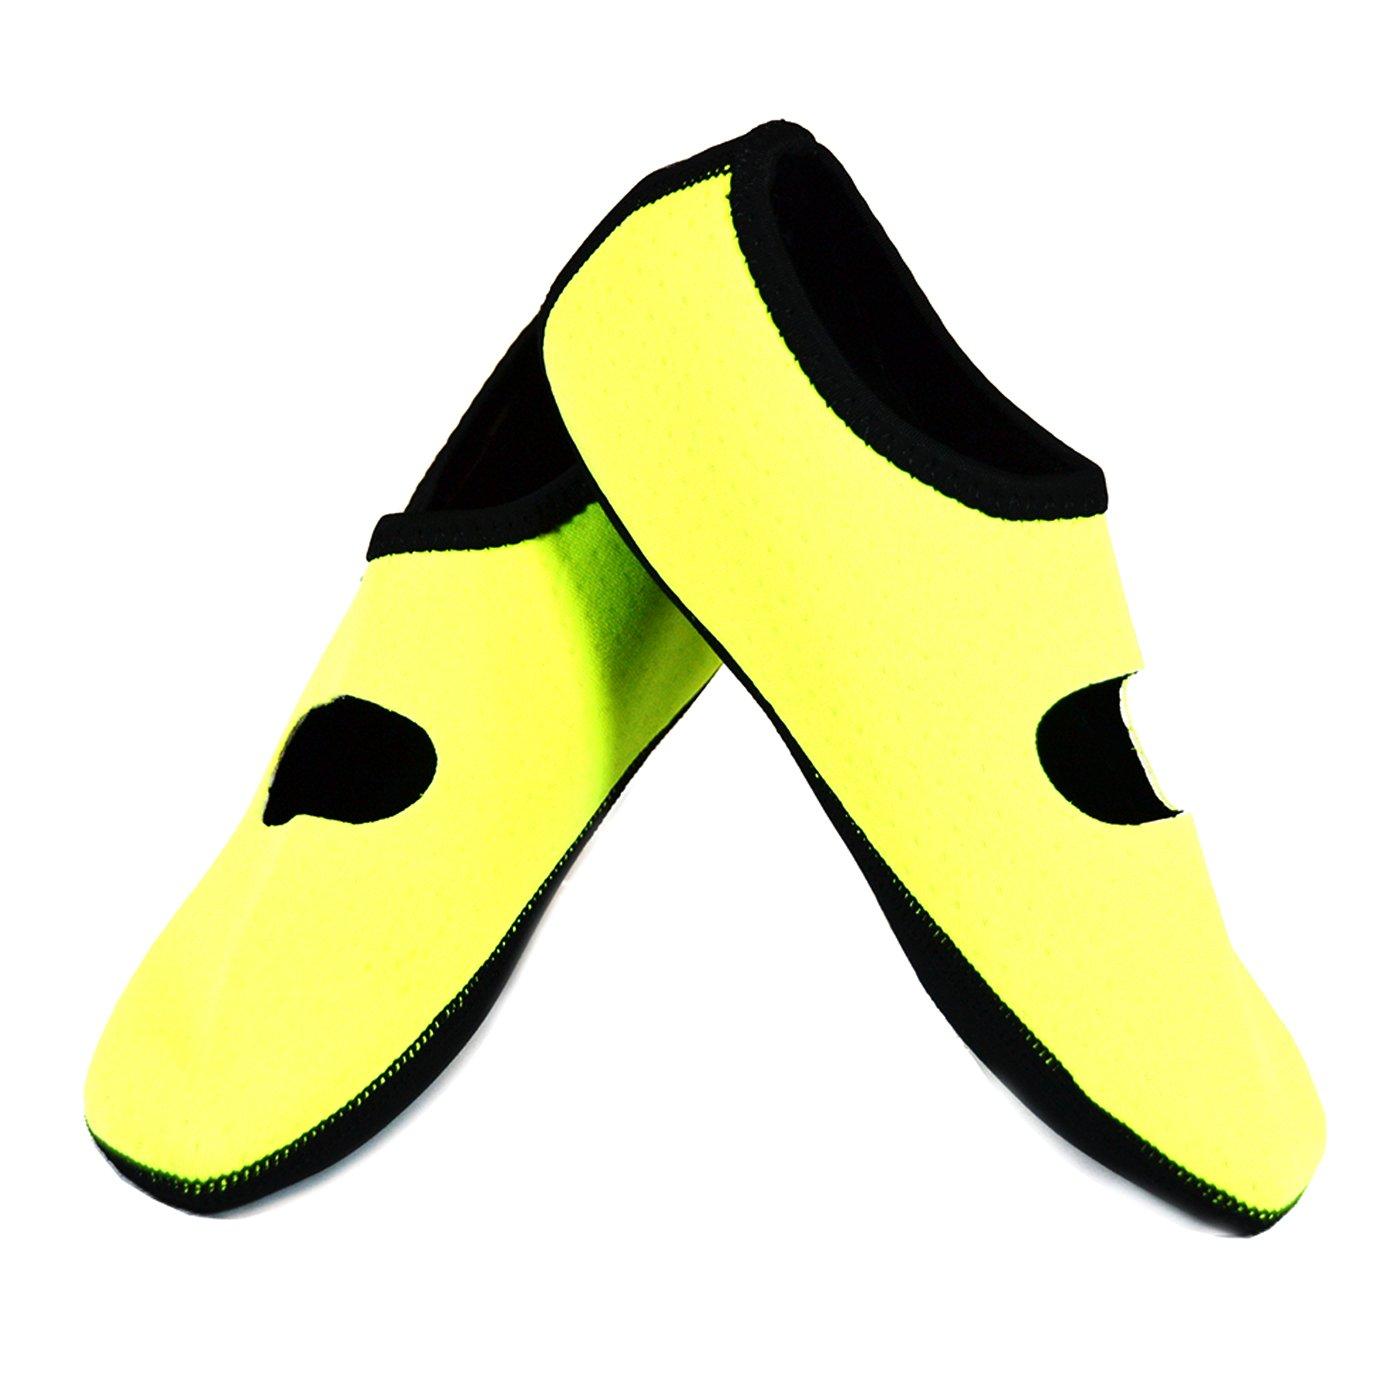 NuFoot Mary Janes Women's Shoes, Best Foldable & Flexible Flats, Slipper Socks, Travel Slippers & Exercise Shoes, Dance Shoes, Yoga Socks, House Shoes, Indoor Slippers, Neon Yellow, Medium